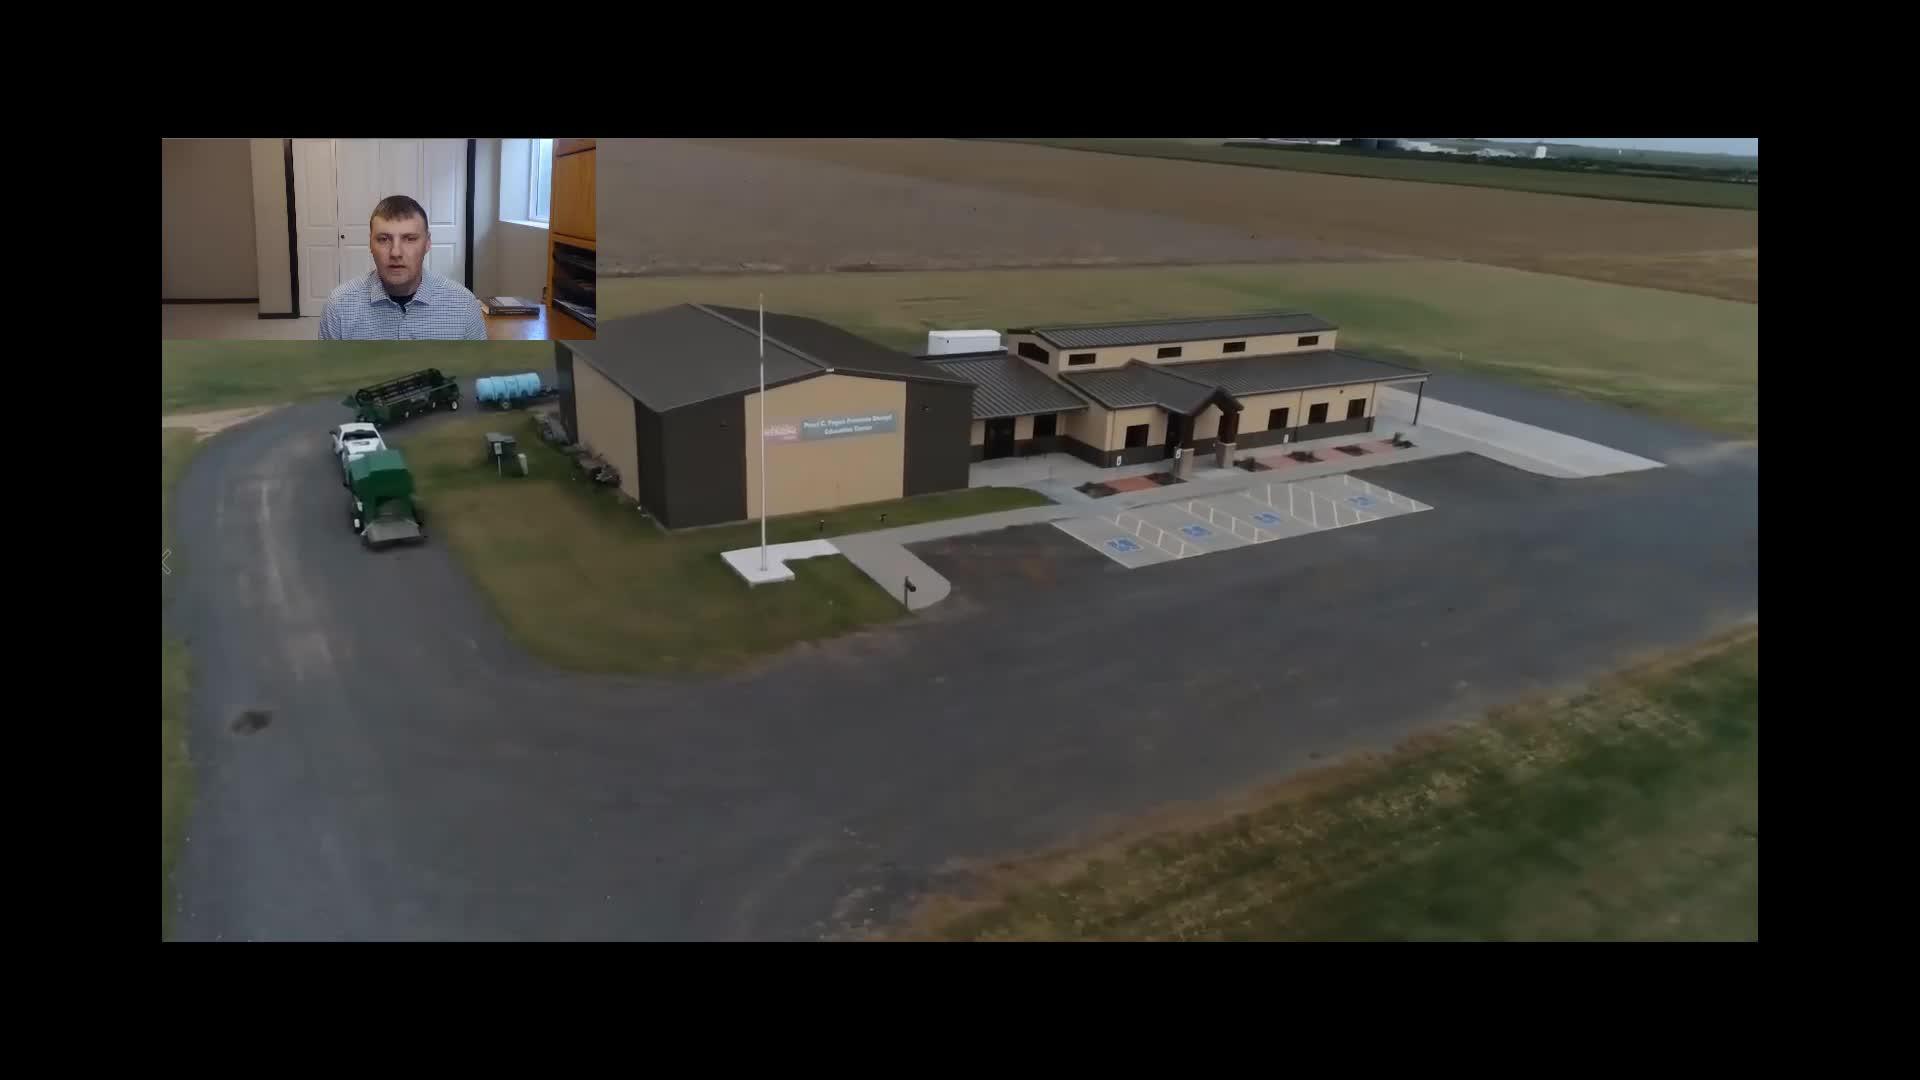 Stumpf Farm – Irrigation x Hybrid x Population Study